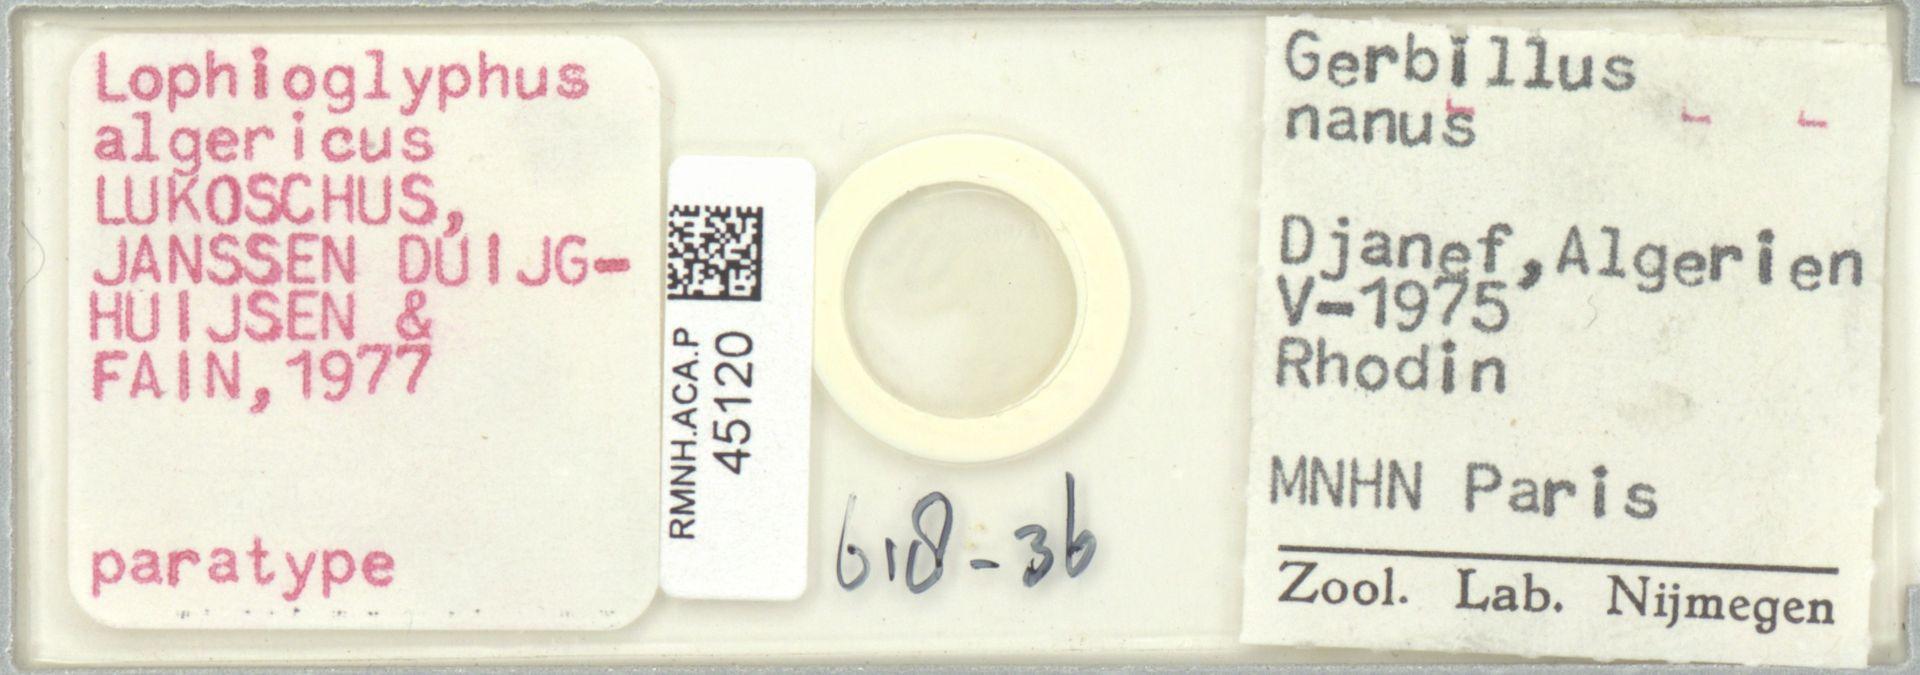 RMNH.ACA.P.45120 | Lophioglyphus algericus Lukoschus, Janssen Duijghuijsen & Fain, 1977